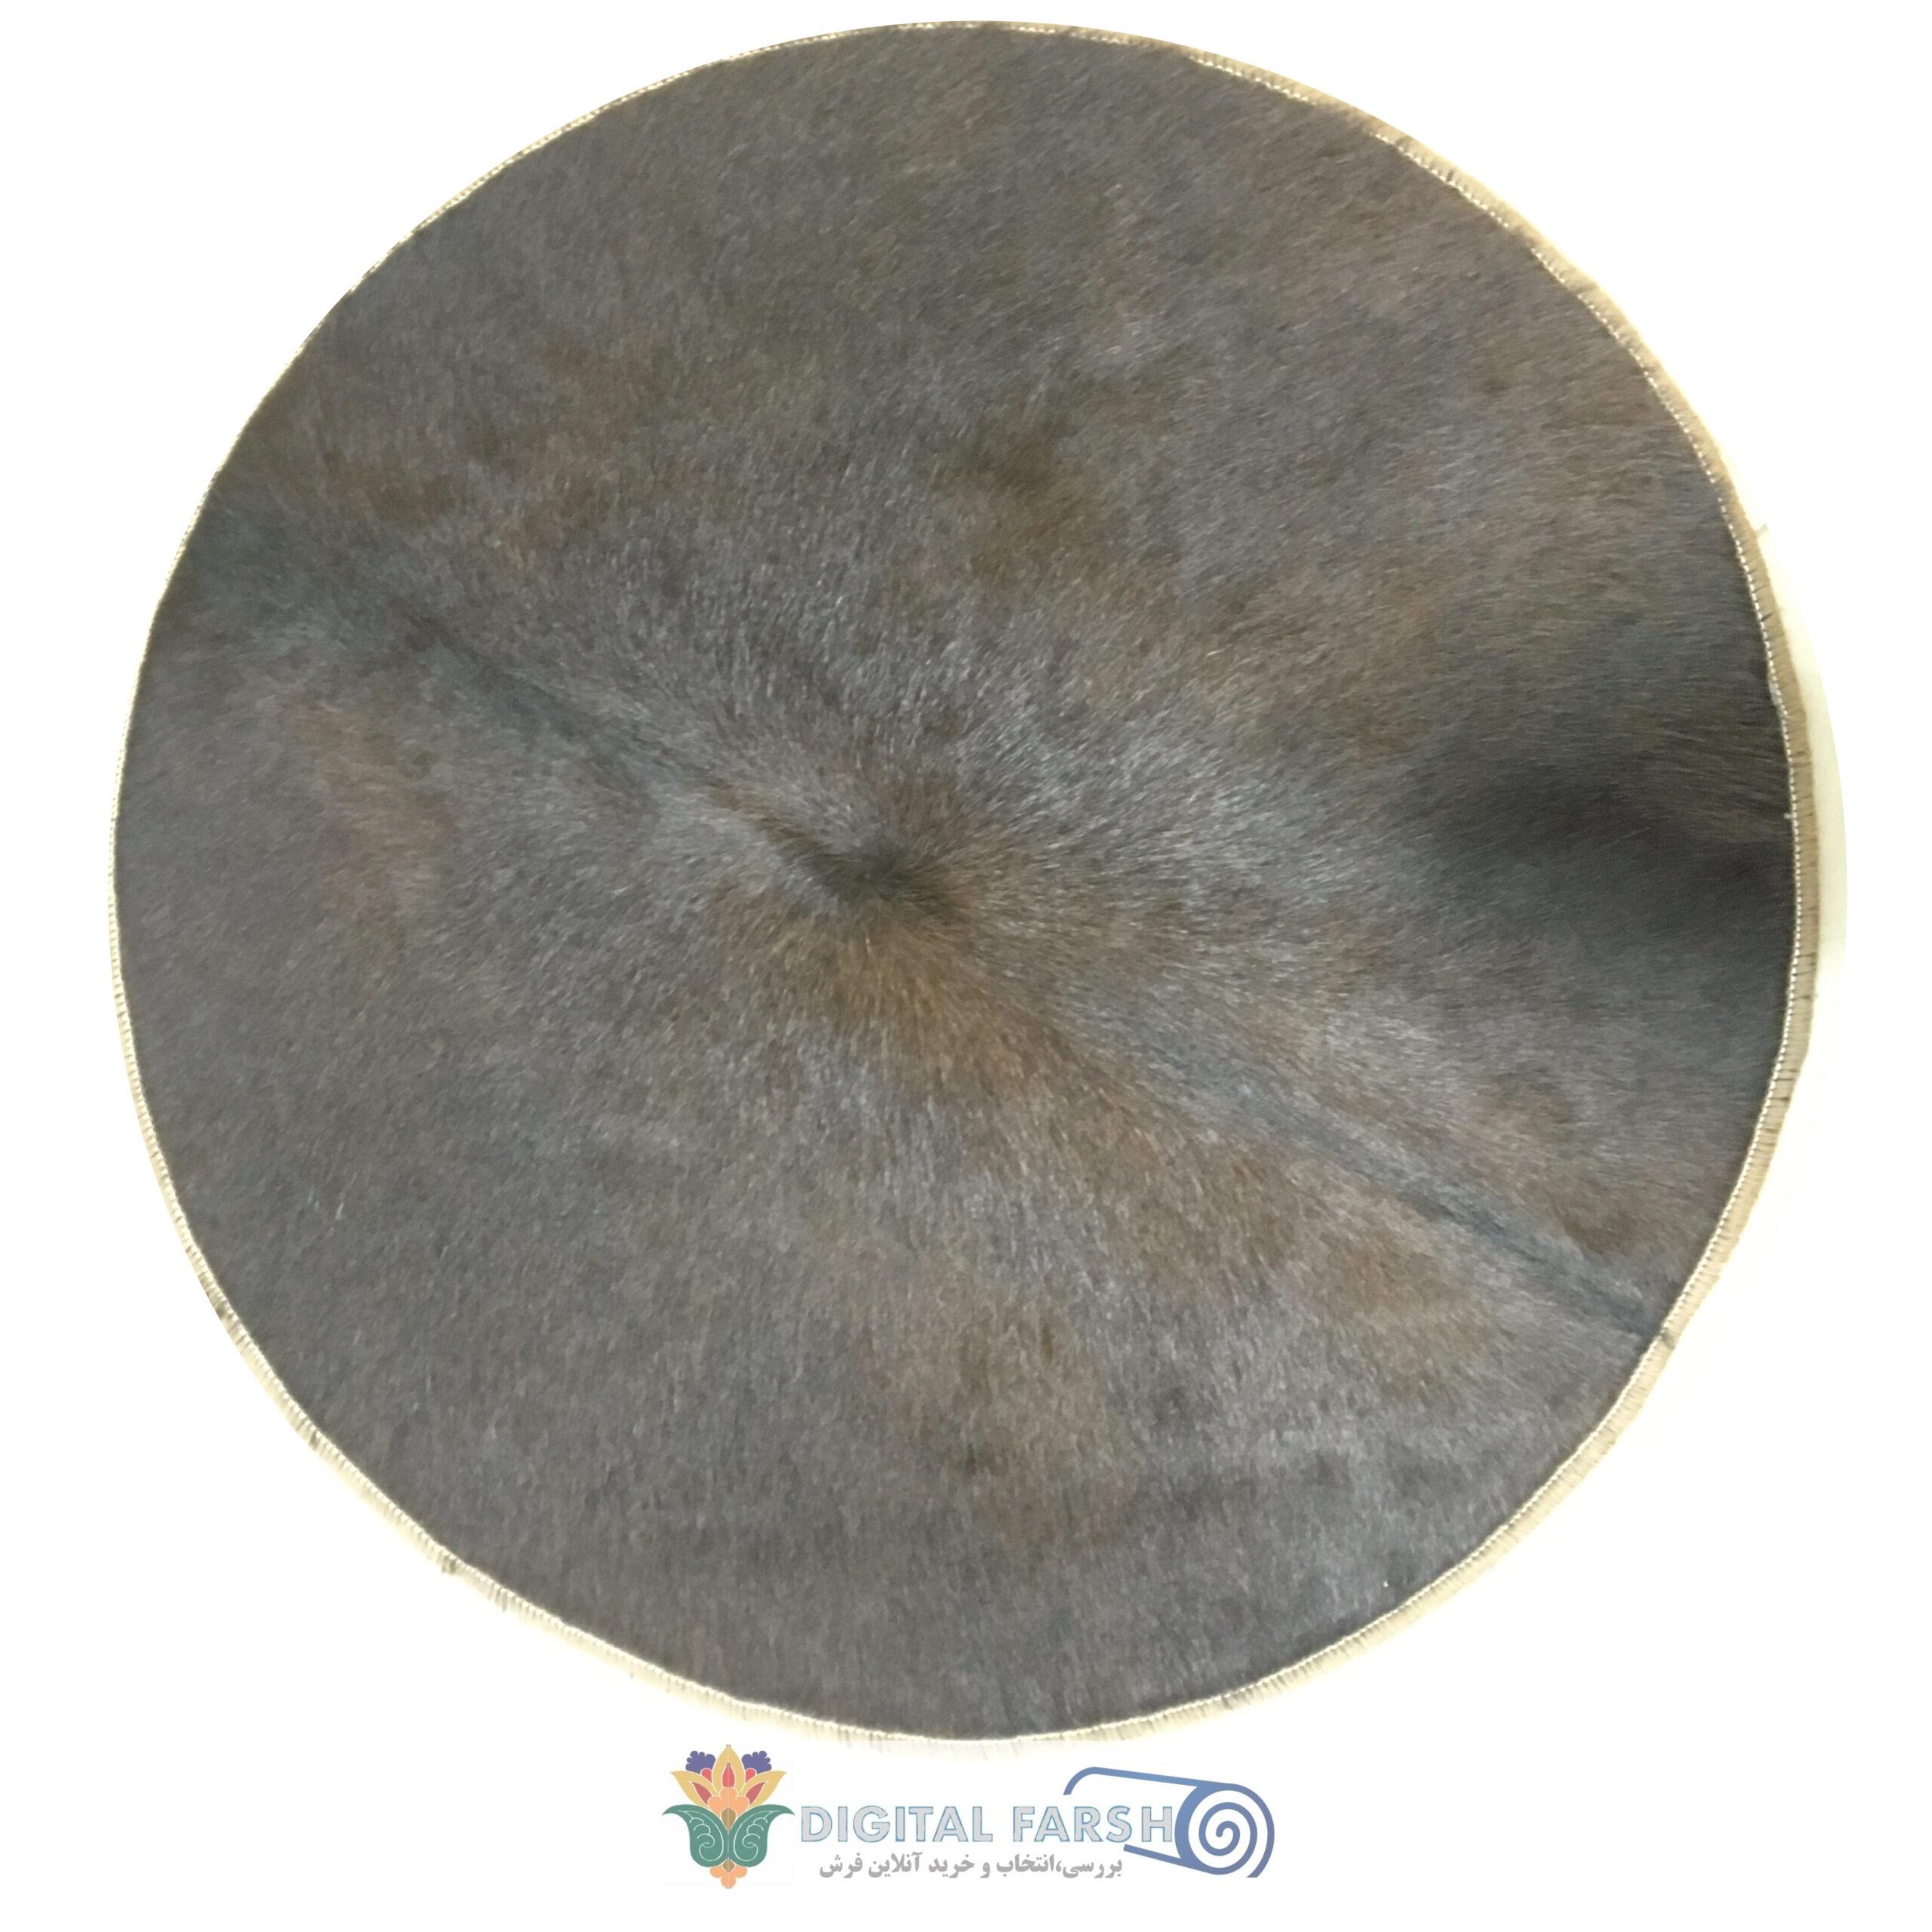 فرش تیکه دوزی پوست طبیعی گاو دایره